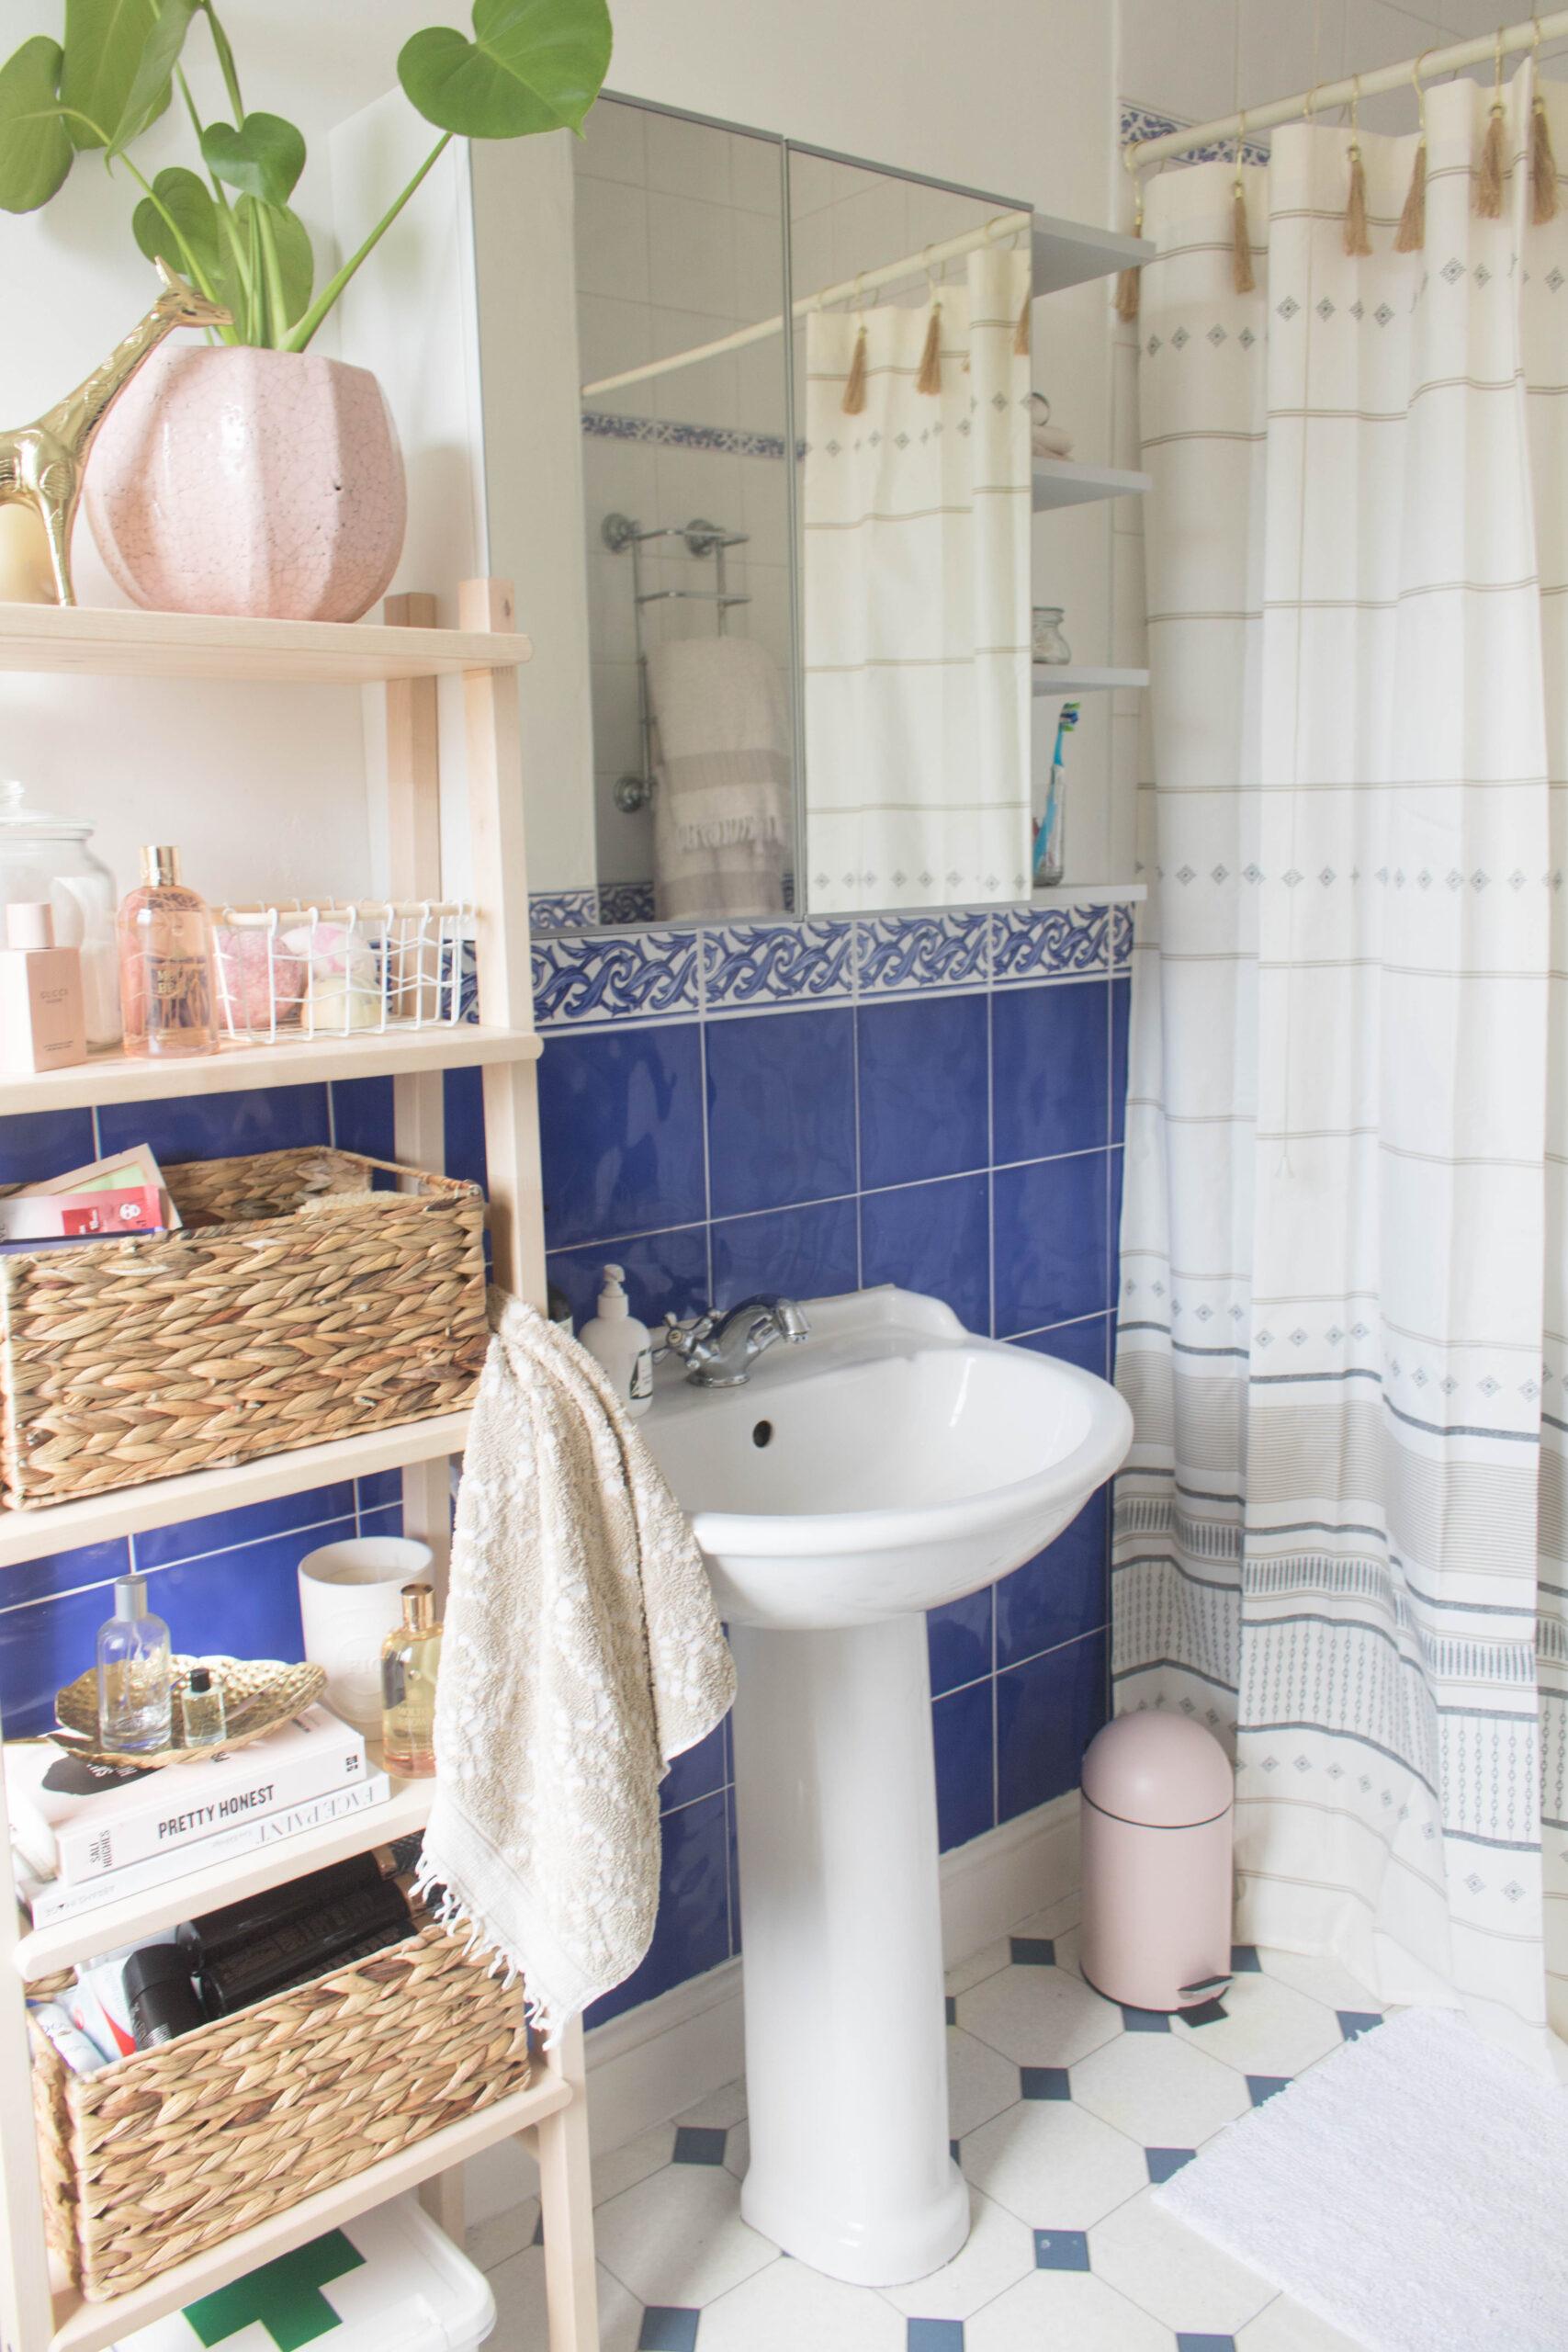 Our Rental Bathroom Renovation Reveal